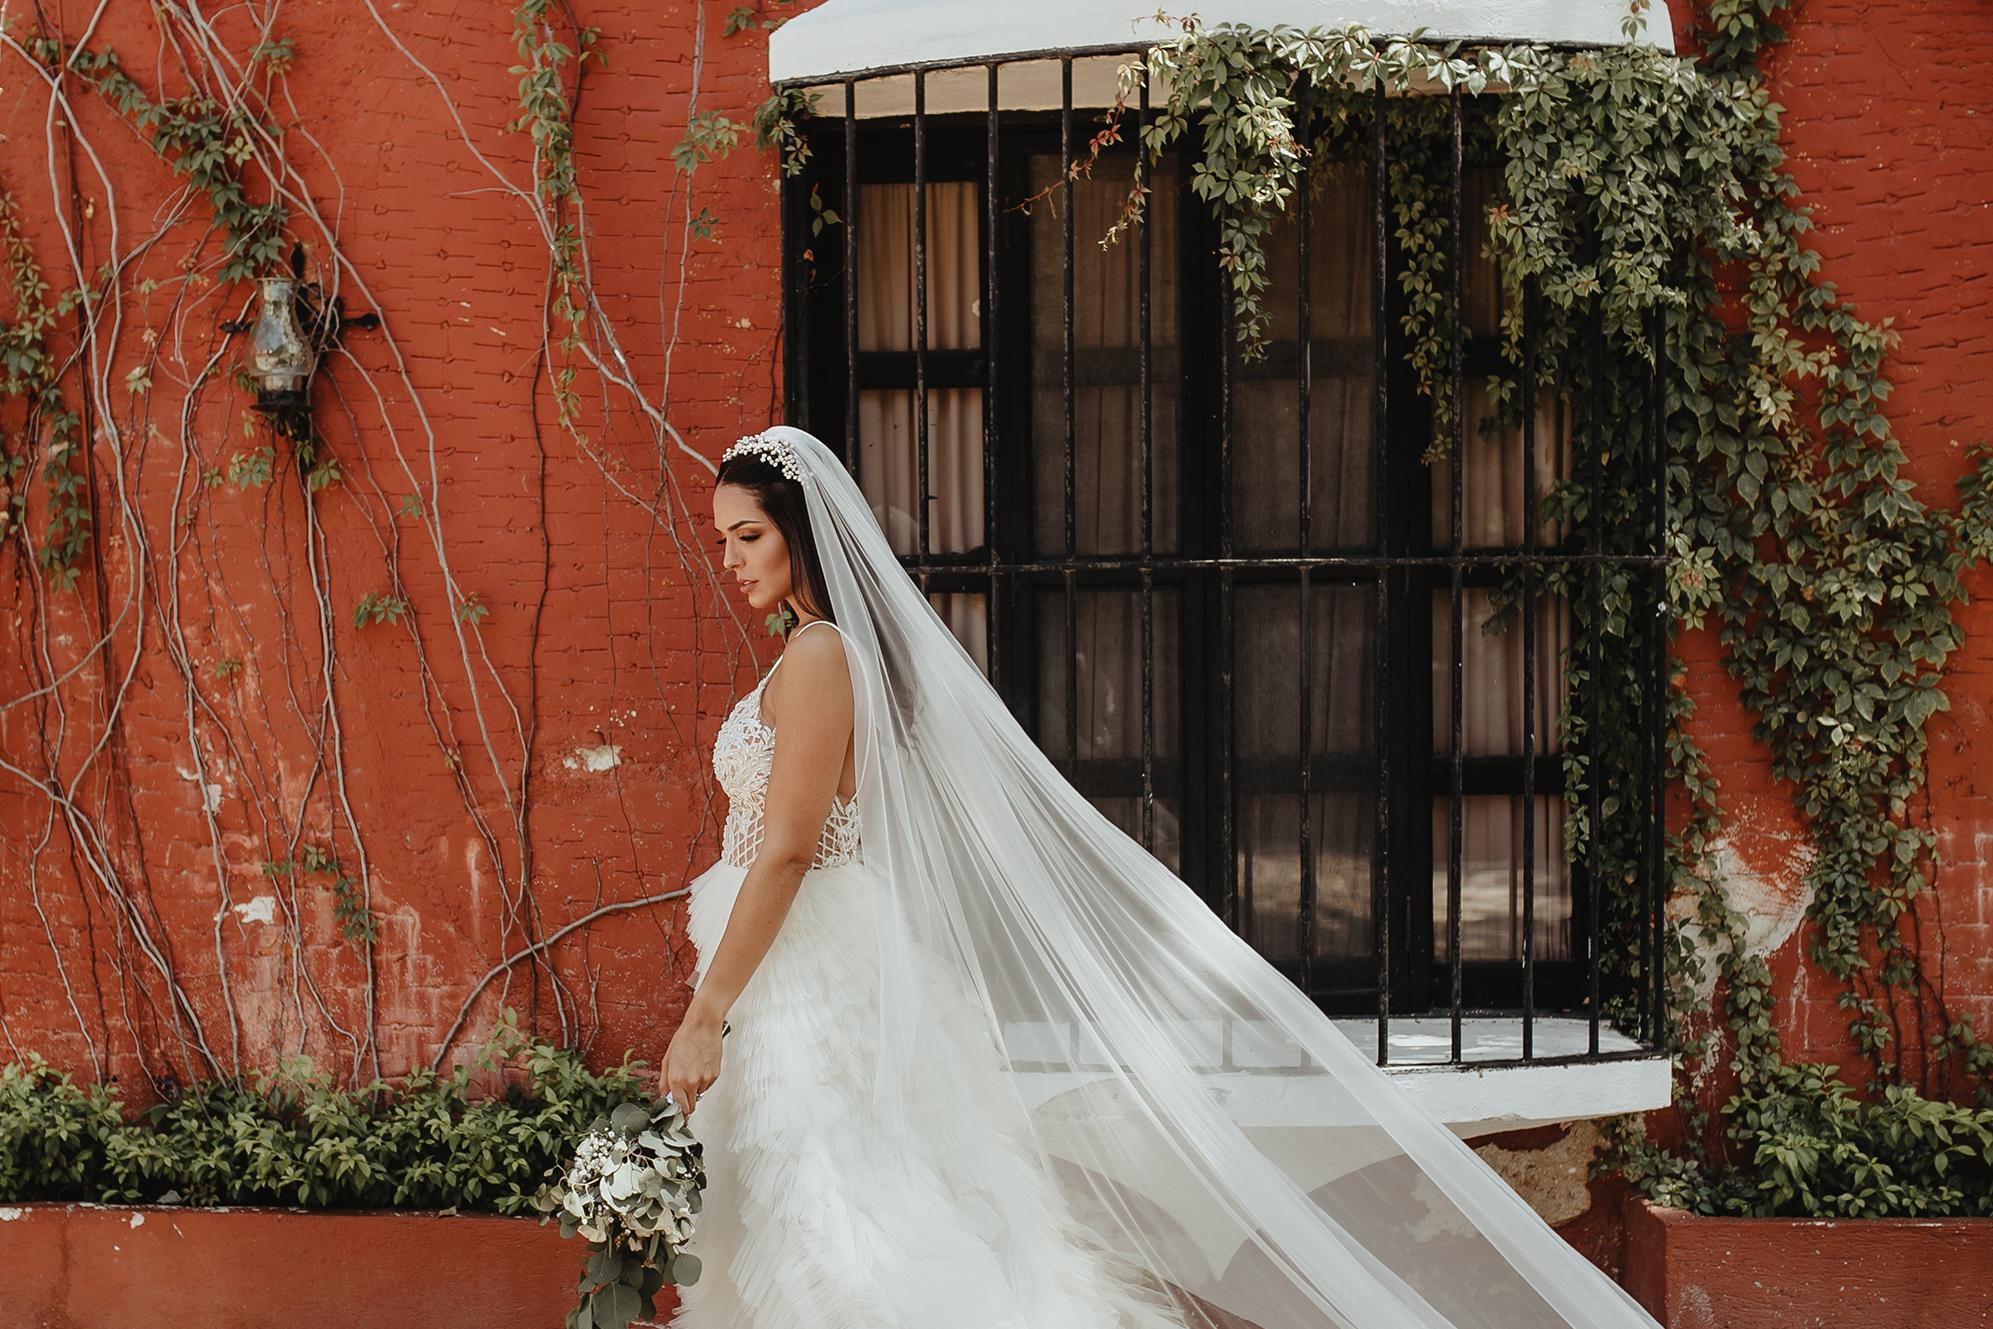 0158R&F__WeddingDestination_Weddingmerida_BodaMexico_FotografoDeBodas_FabrizioSimoneenFotografo.jpg